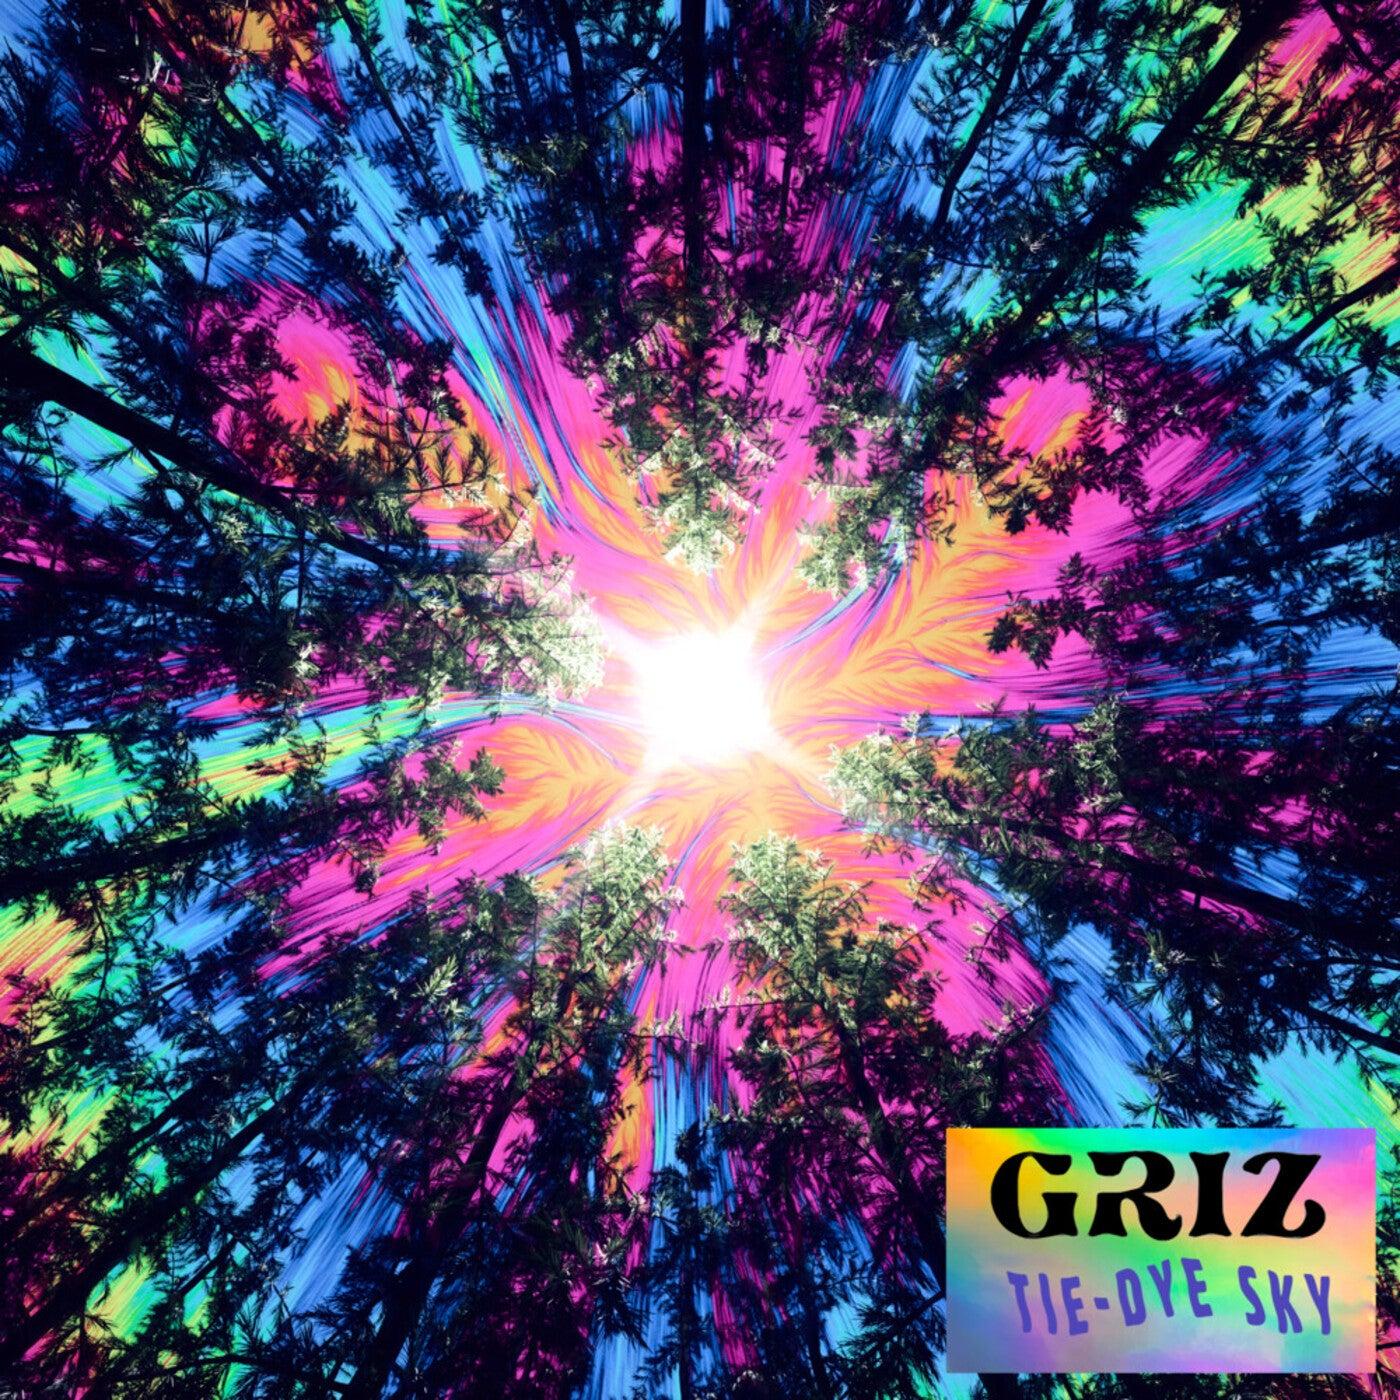 Tie-Dye Sky (Original Mix)